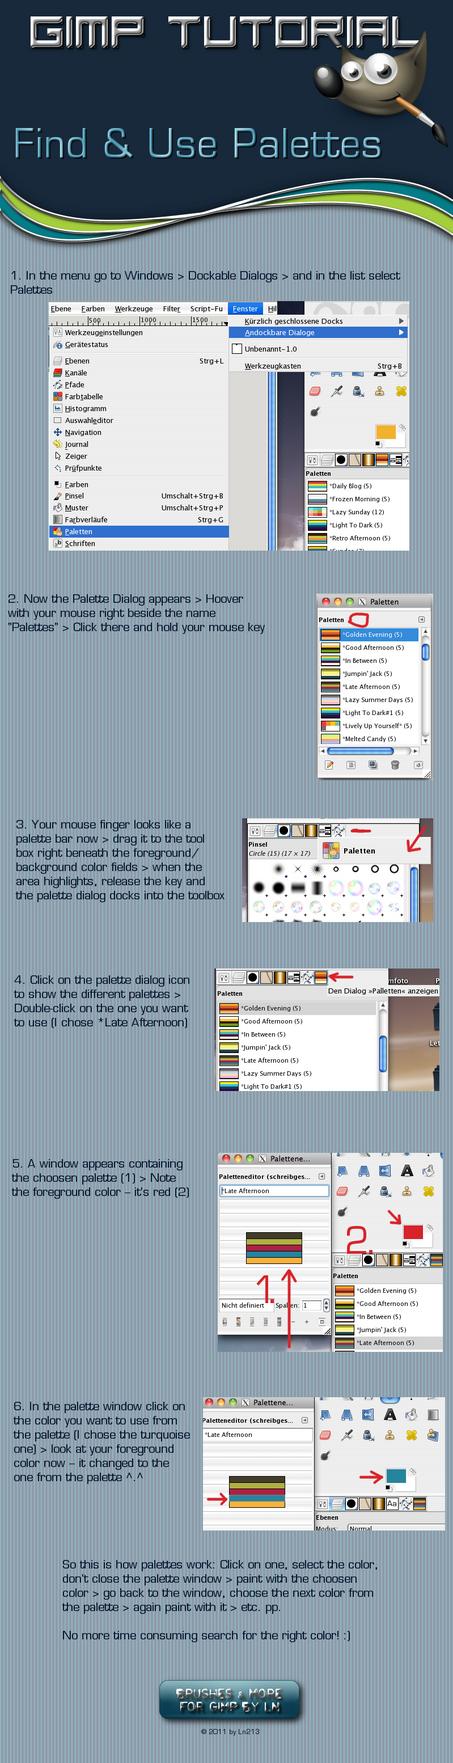 Find and Use Palettes in GIMP by el-L-eN